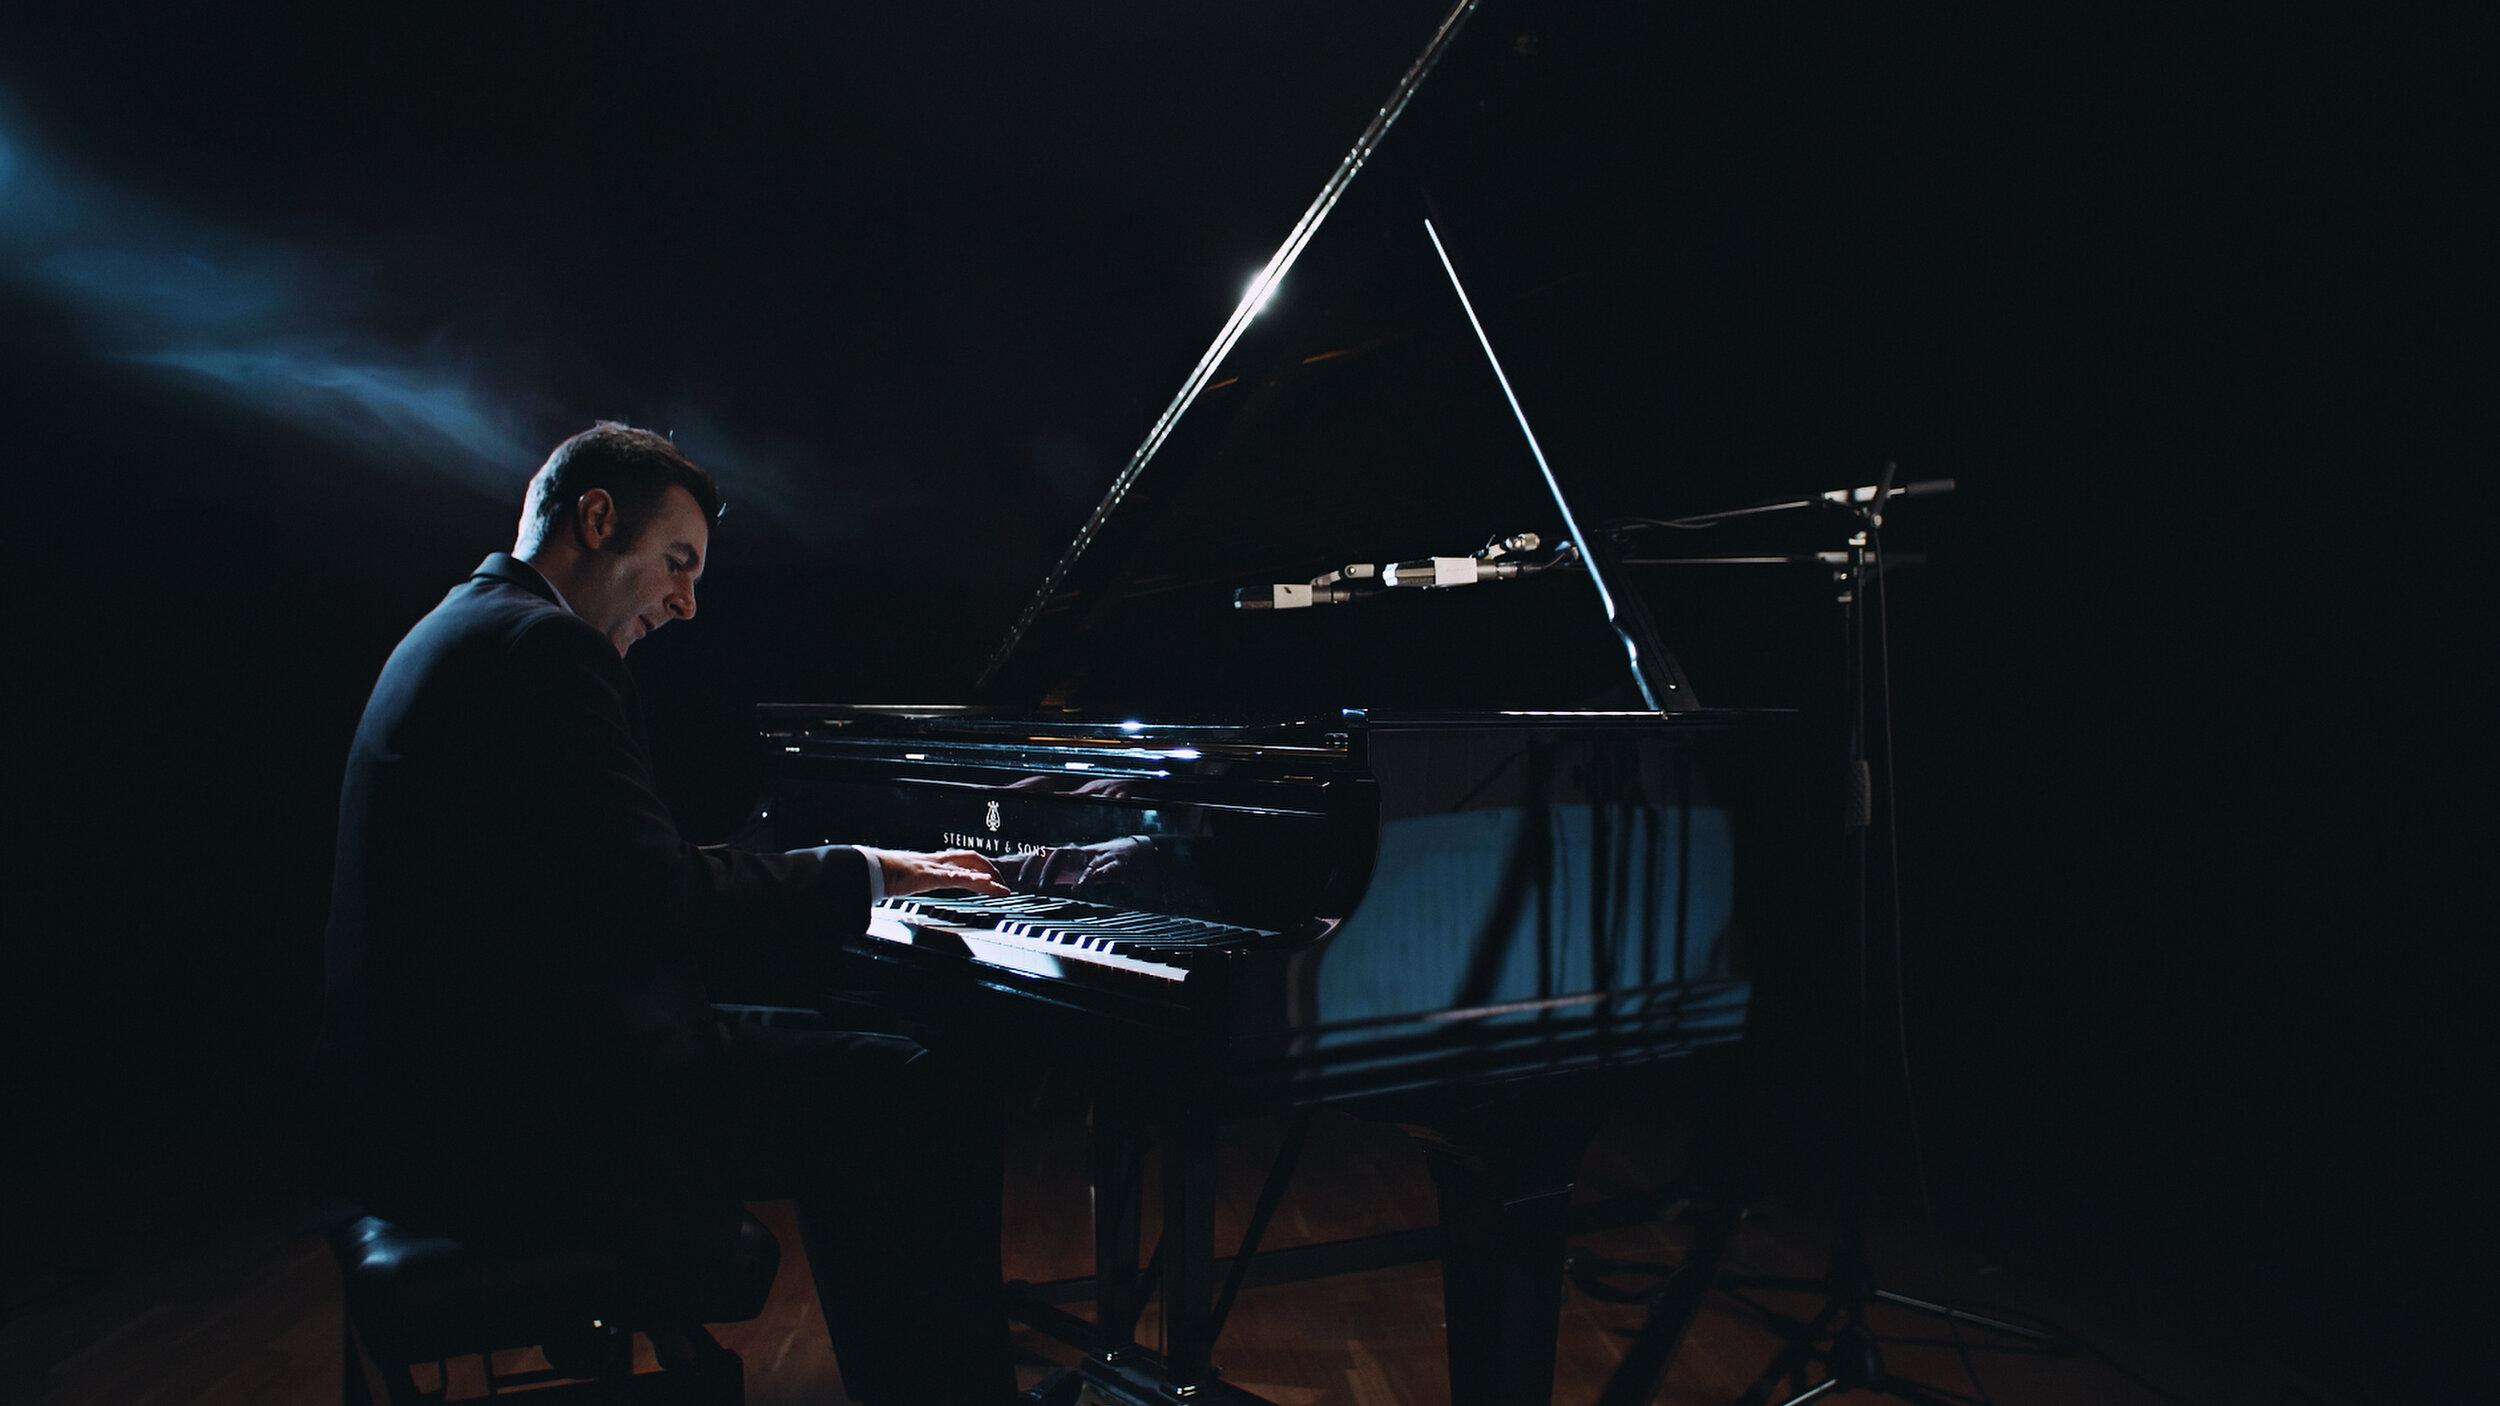 Ubuntu Management Group-Ubuntu Music Signs Acclaimed Pianist Rob Barron For Album Release